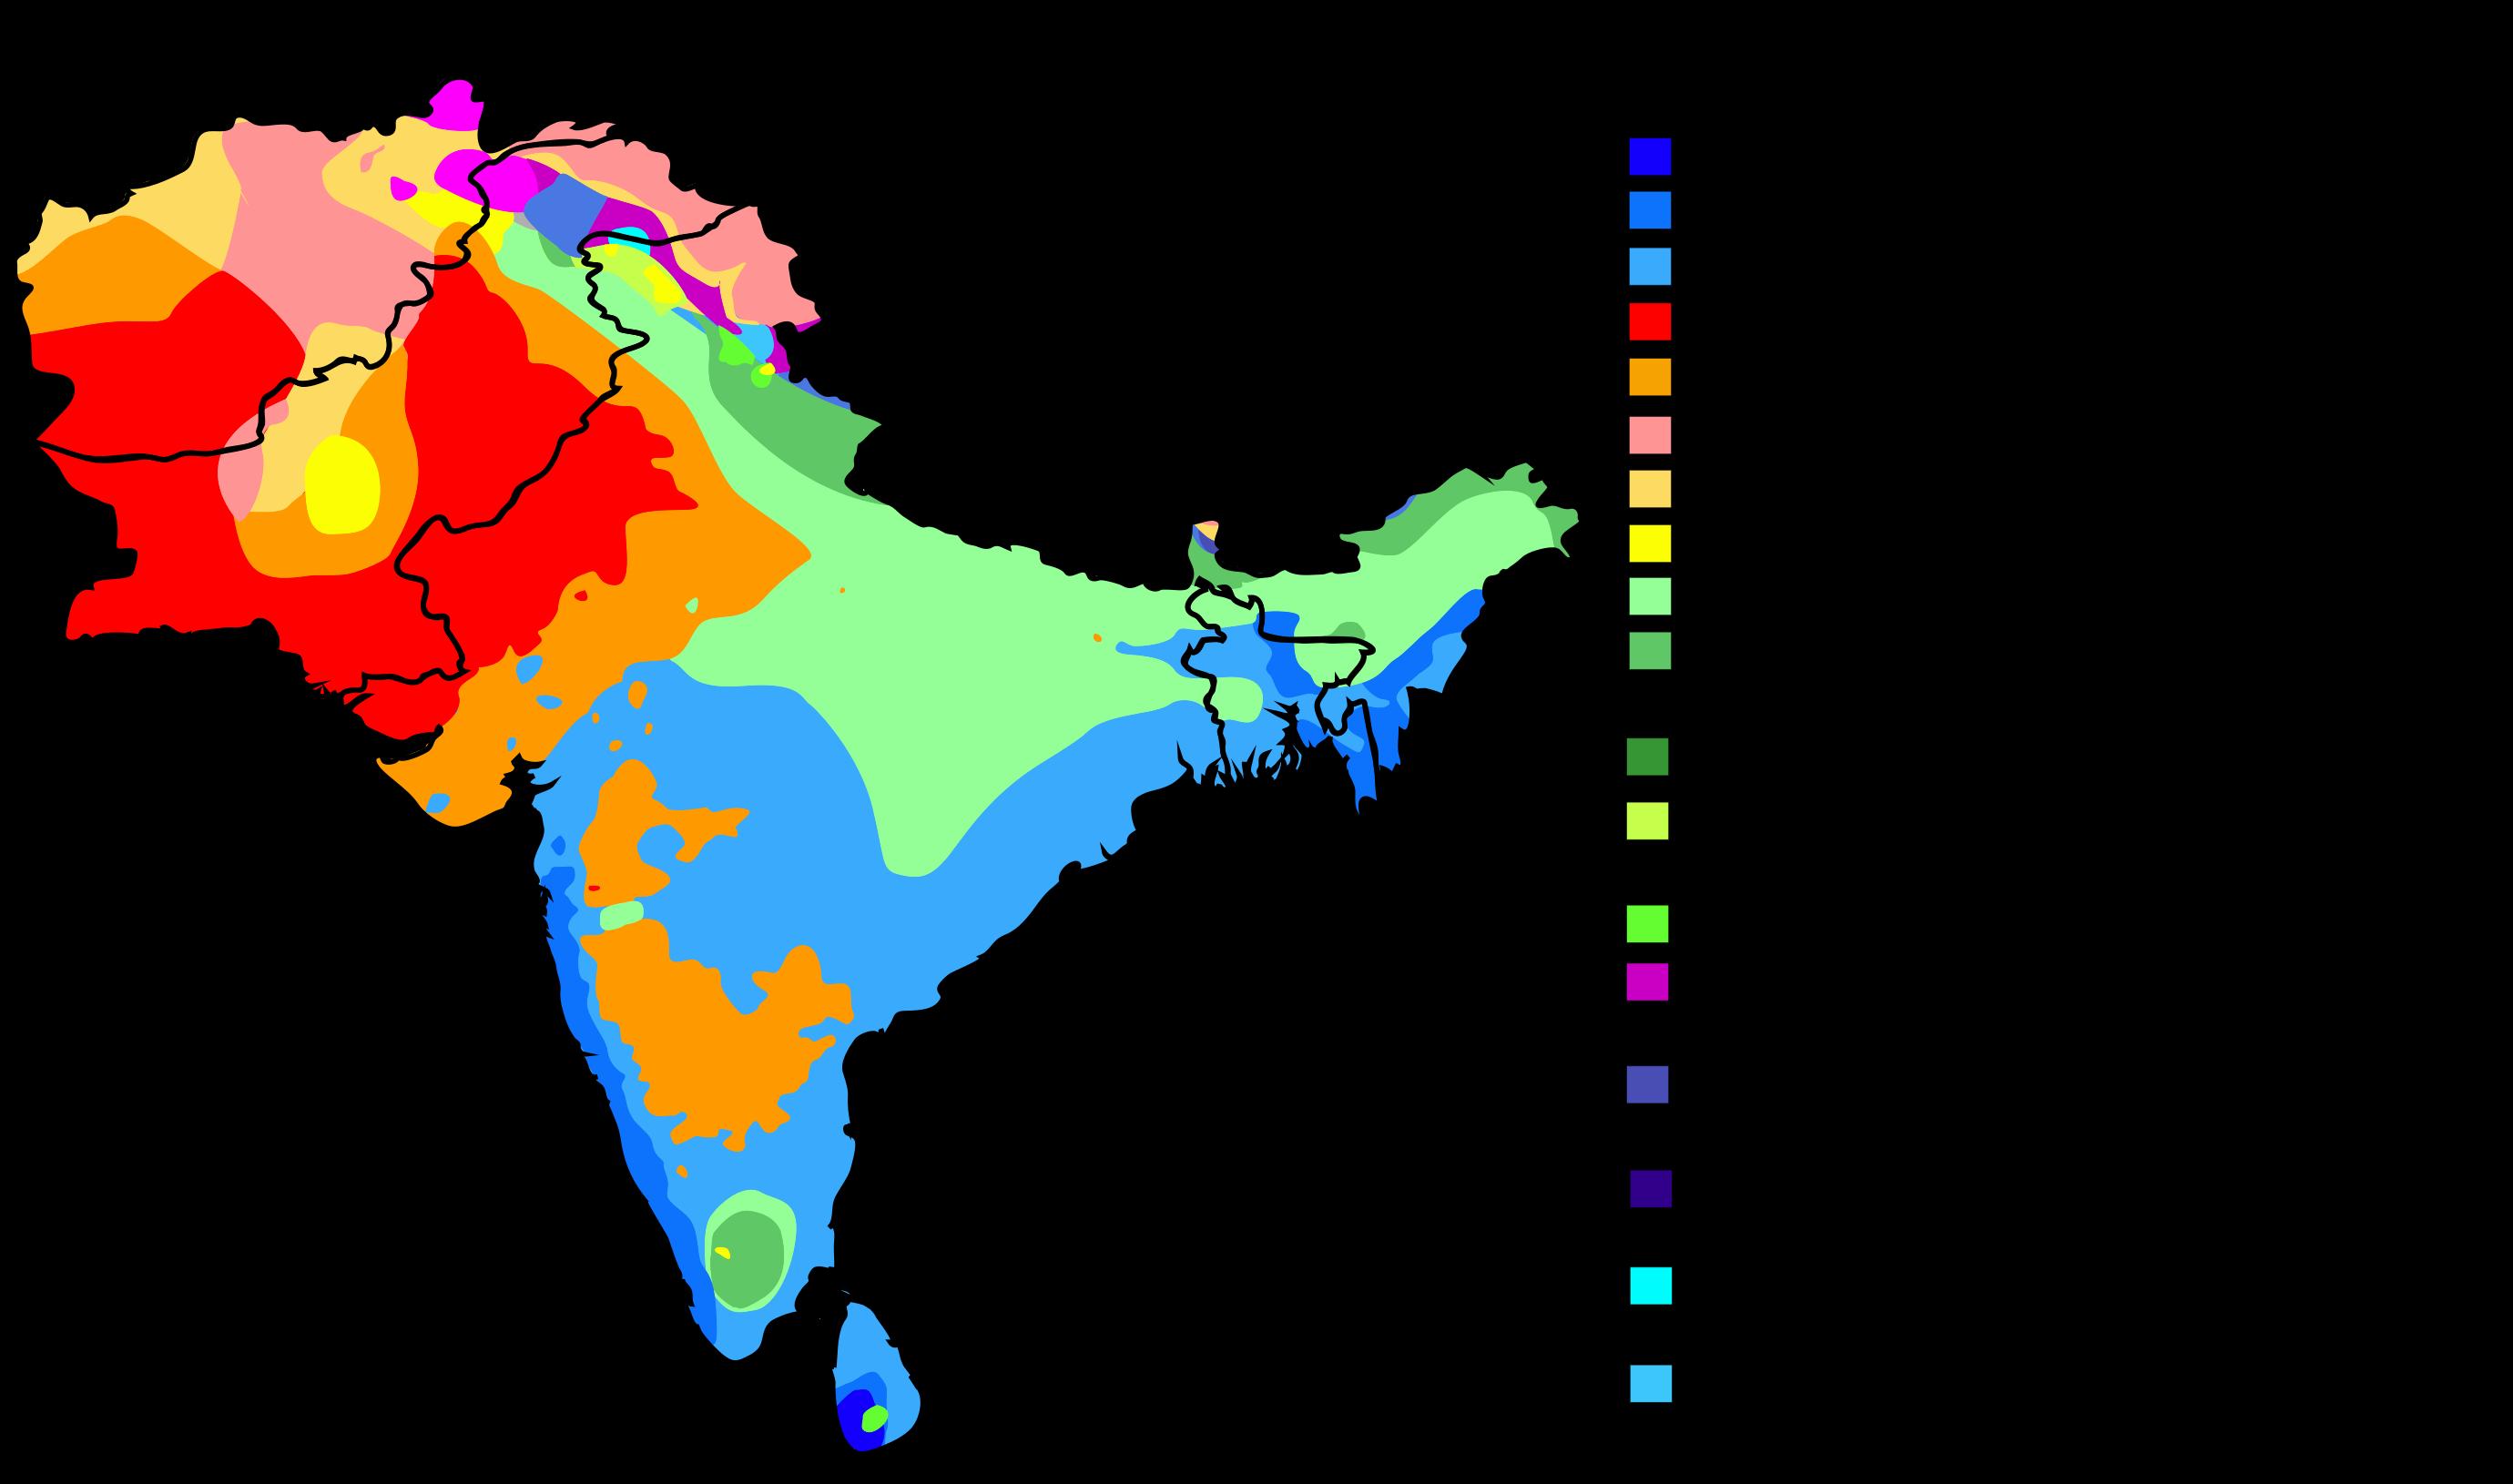 South Asia map of Köppen climate classification | koppen